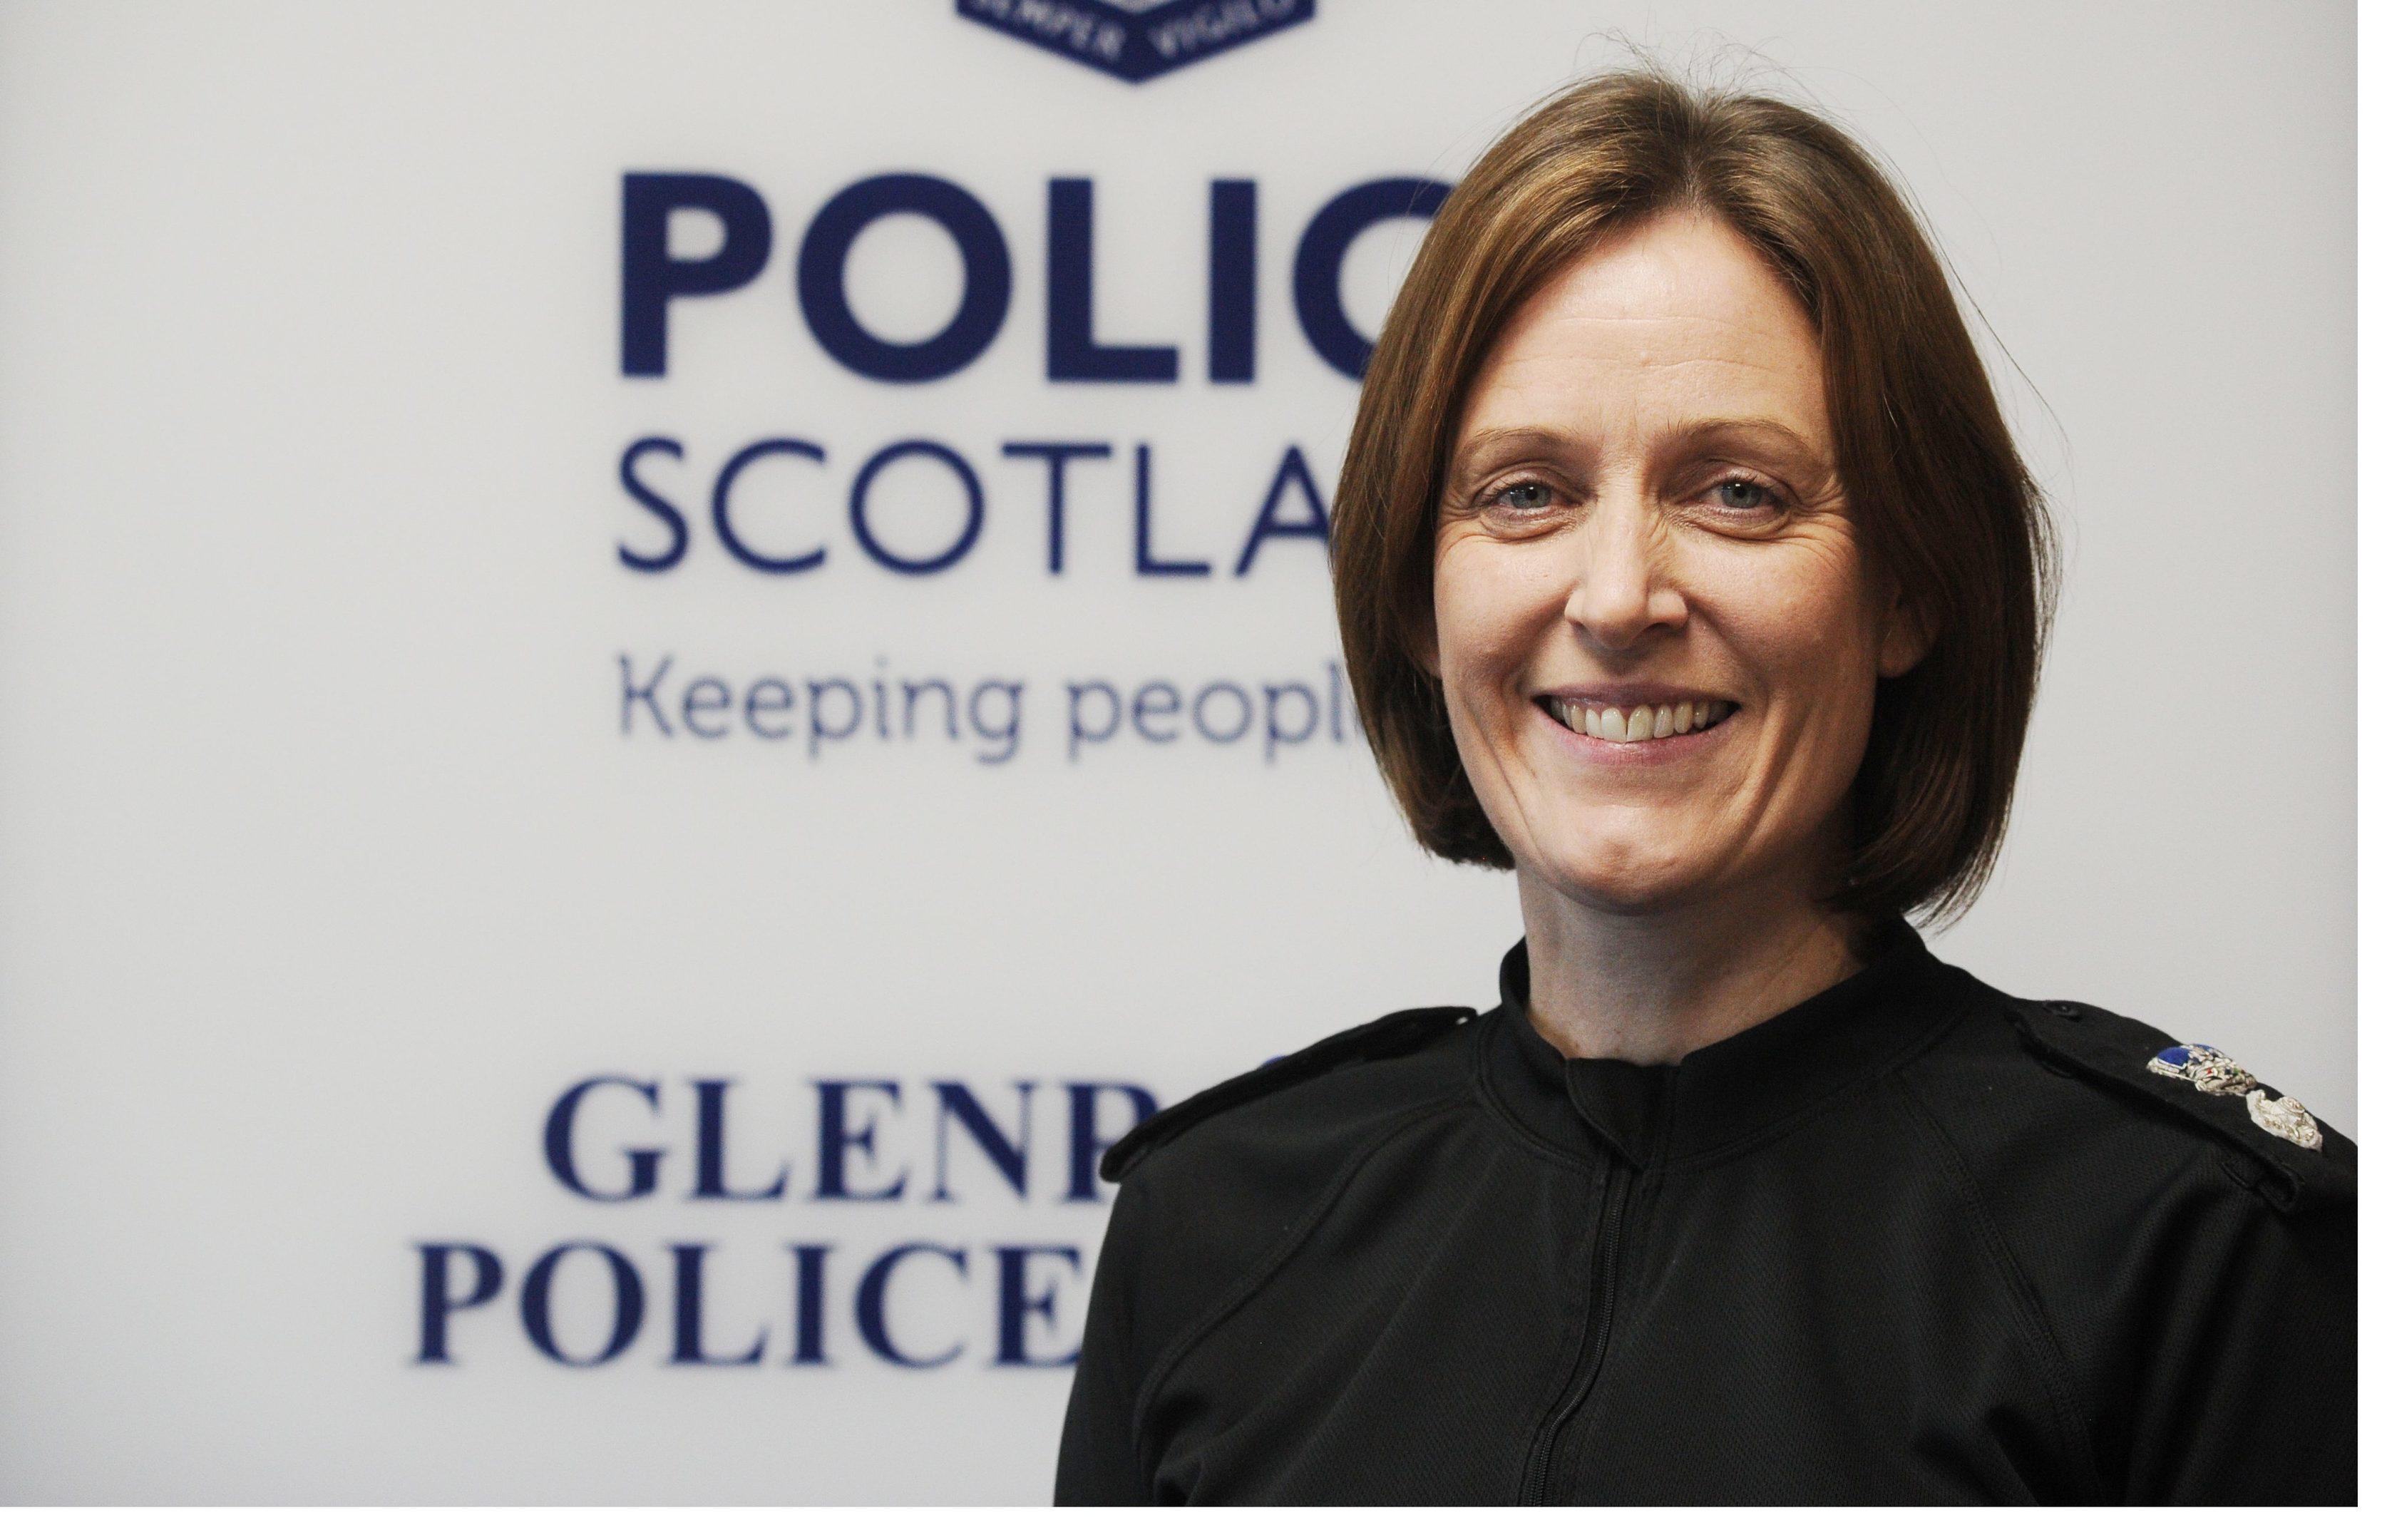 Chief Superintendent  Angela McLaren of Fife Division Police Scotland